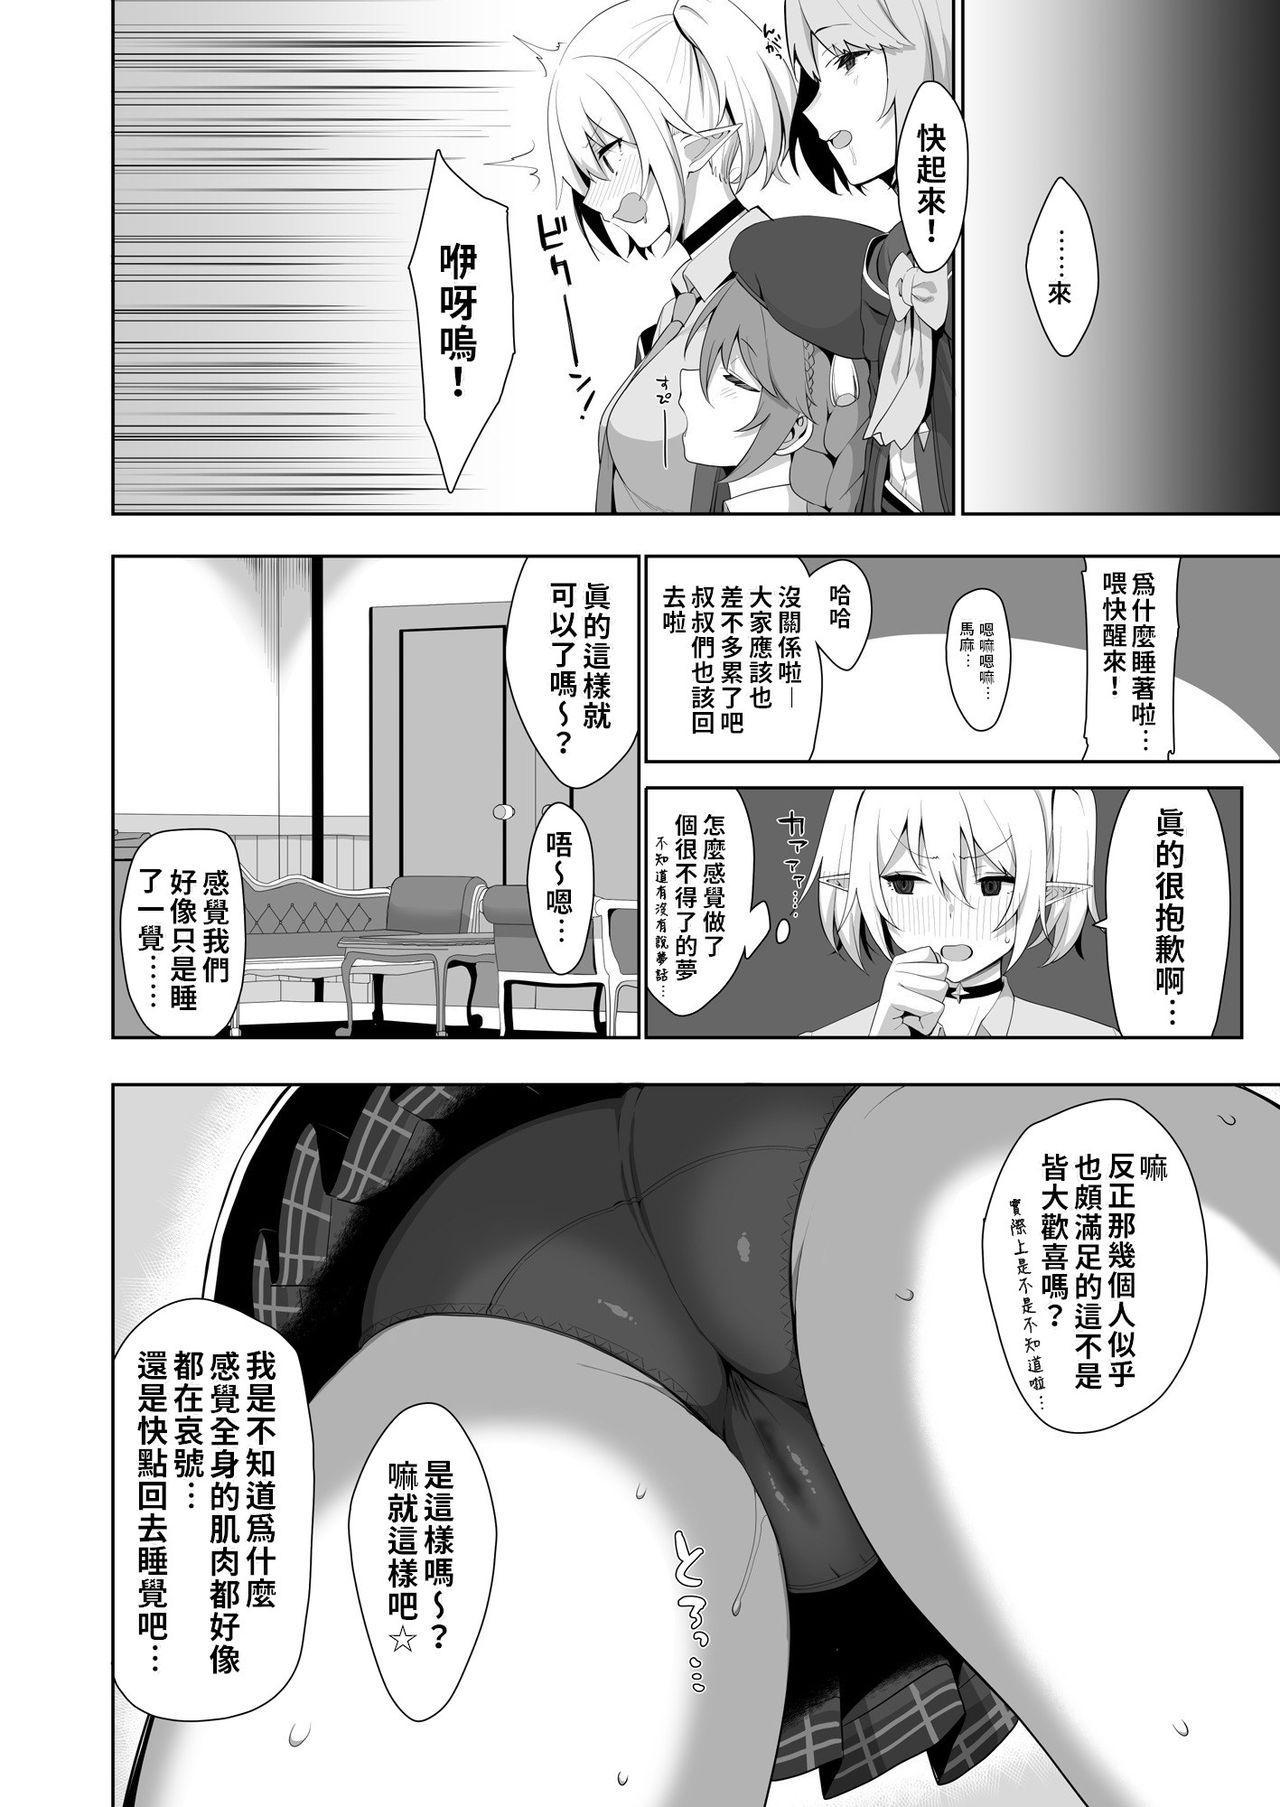 Naka〇shibu Katsudoukiroku 好〇友社活動紀錄 19